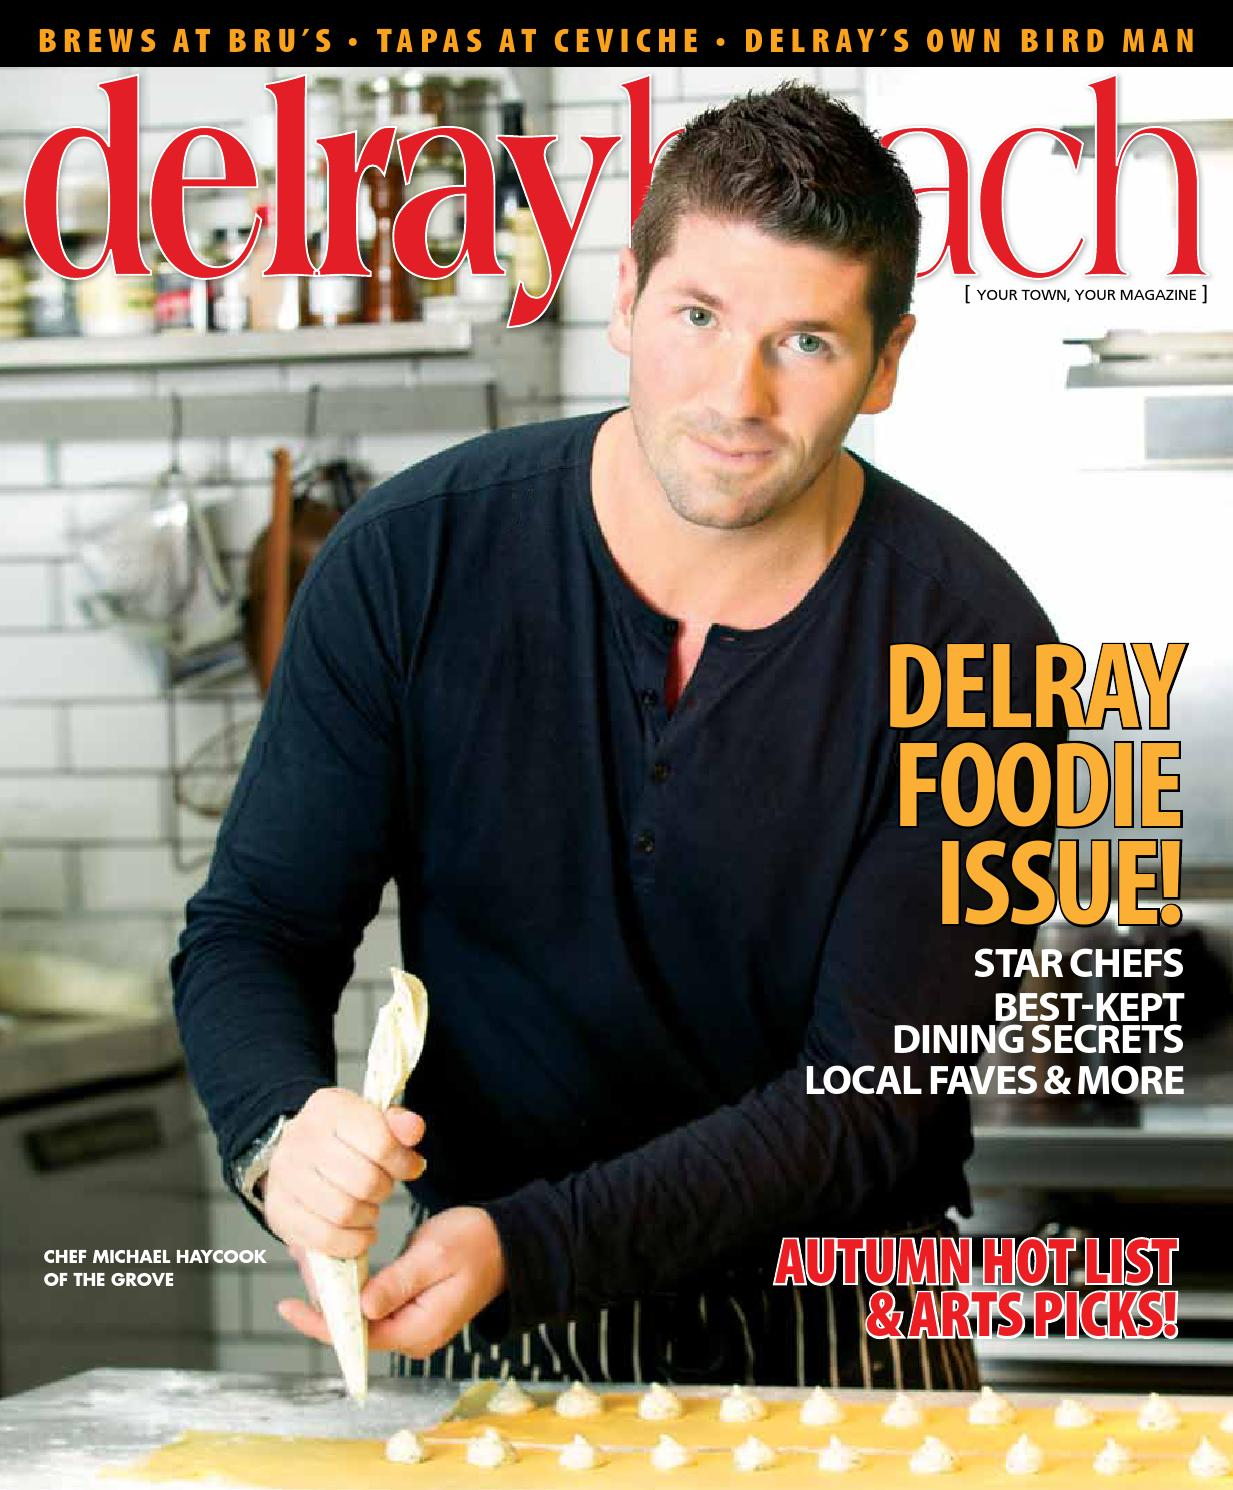 delray beach magazine oct nov 2013 by jes publishing   issuu  rh   issuu